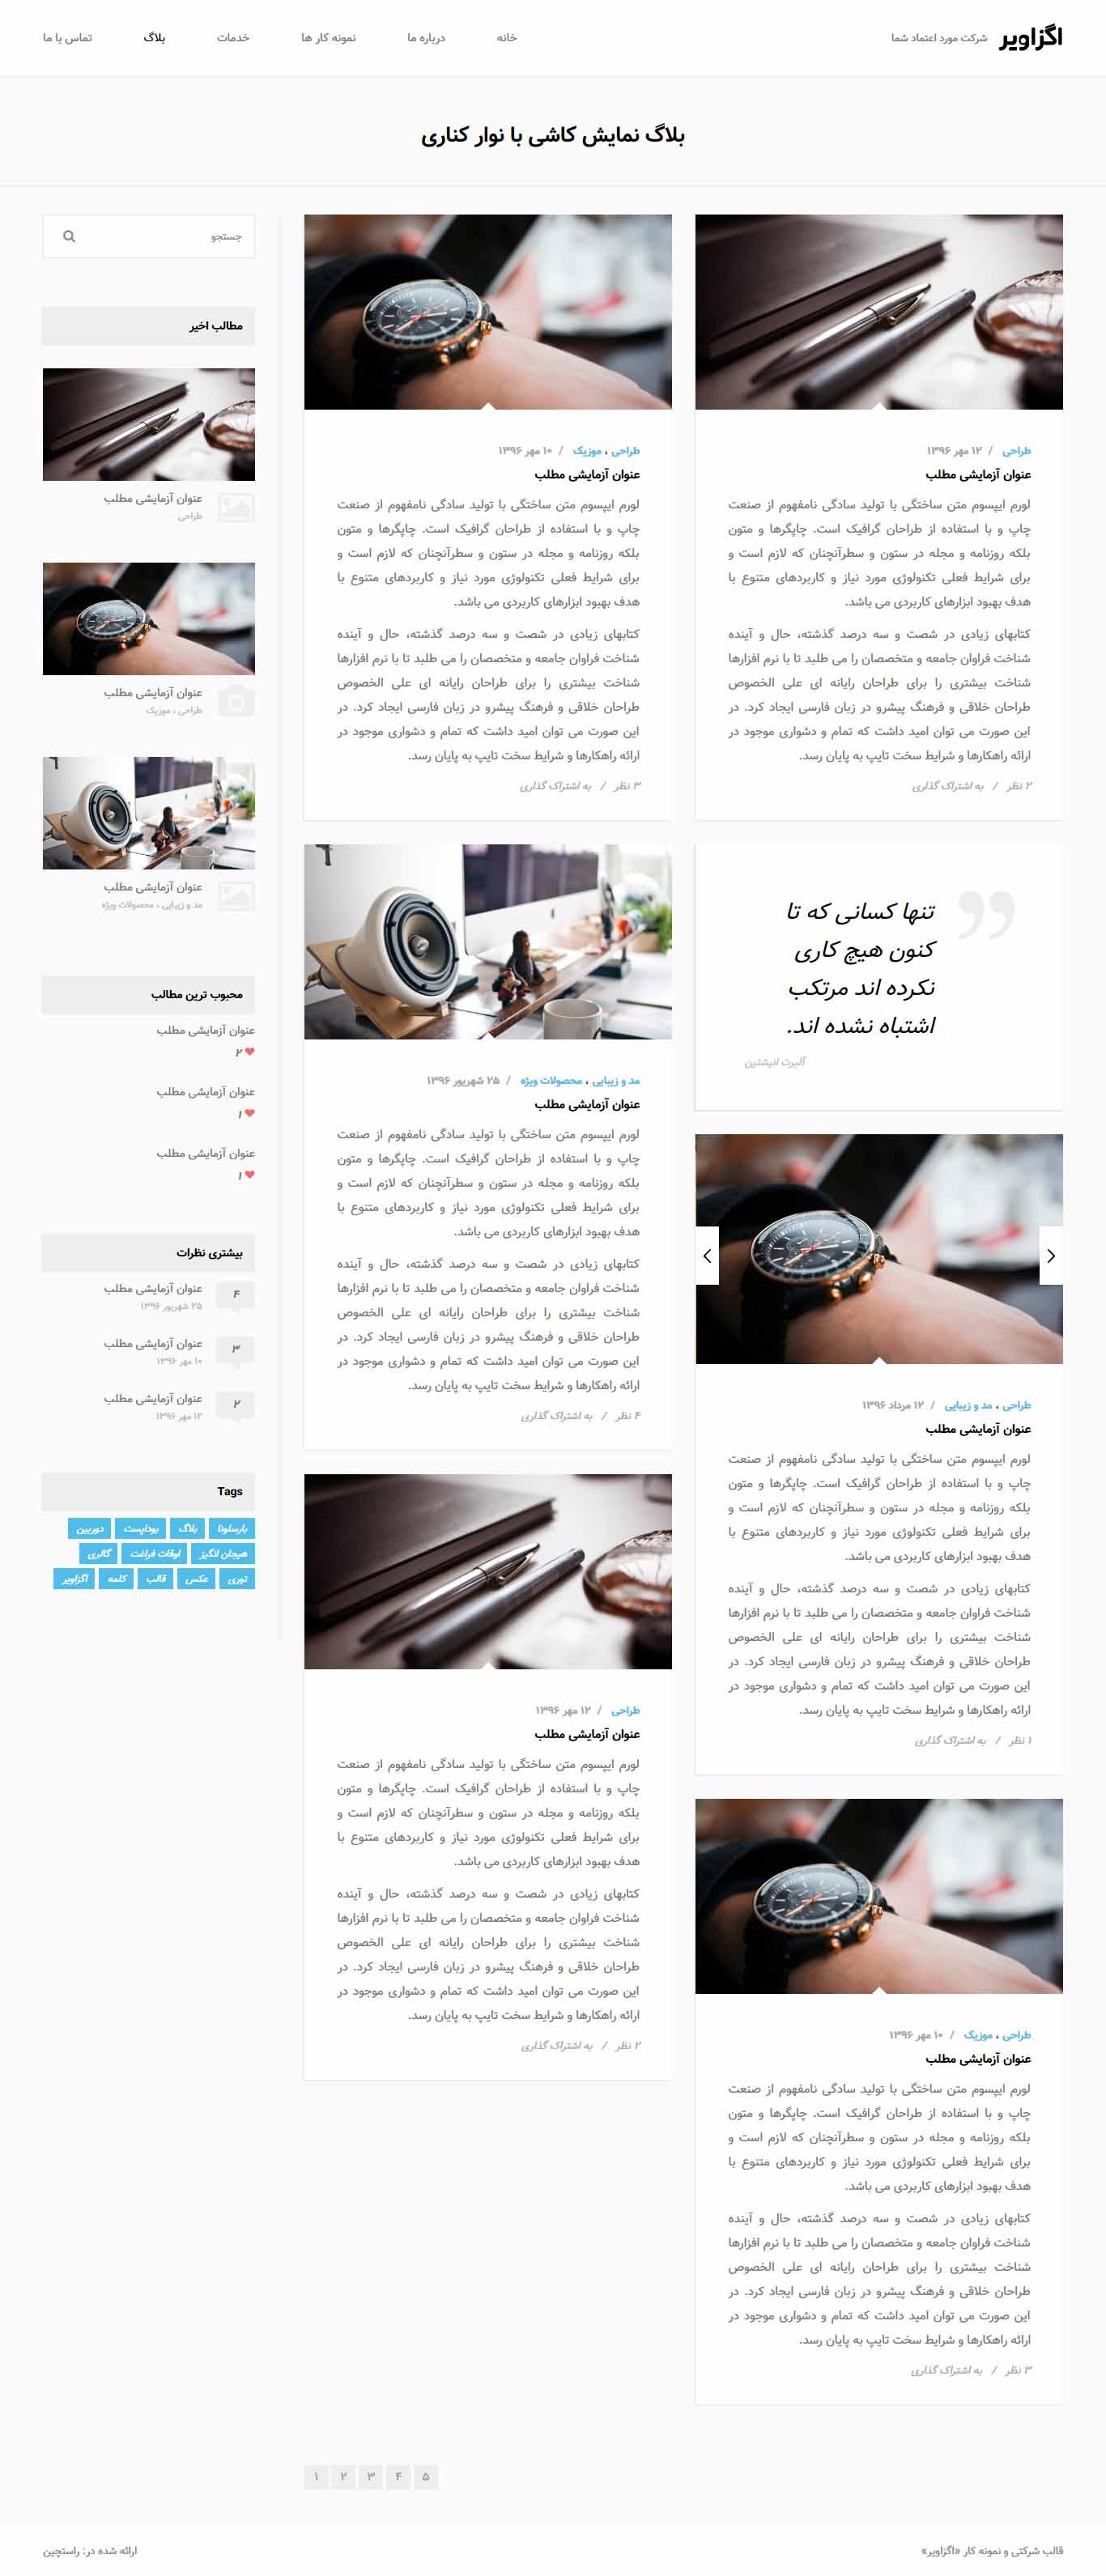 قالب Xavier | قالب اگزاویر پوسته ریسپانسیو حرفه ای نمونه کار قالب html شرکتی اگزاویر